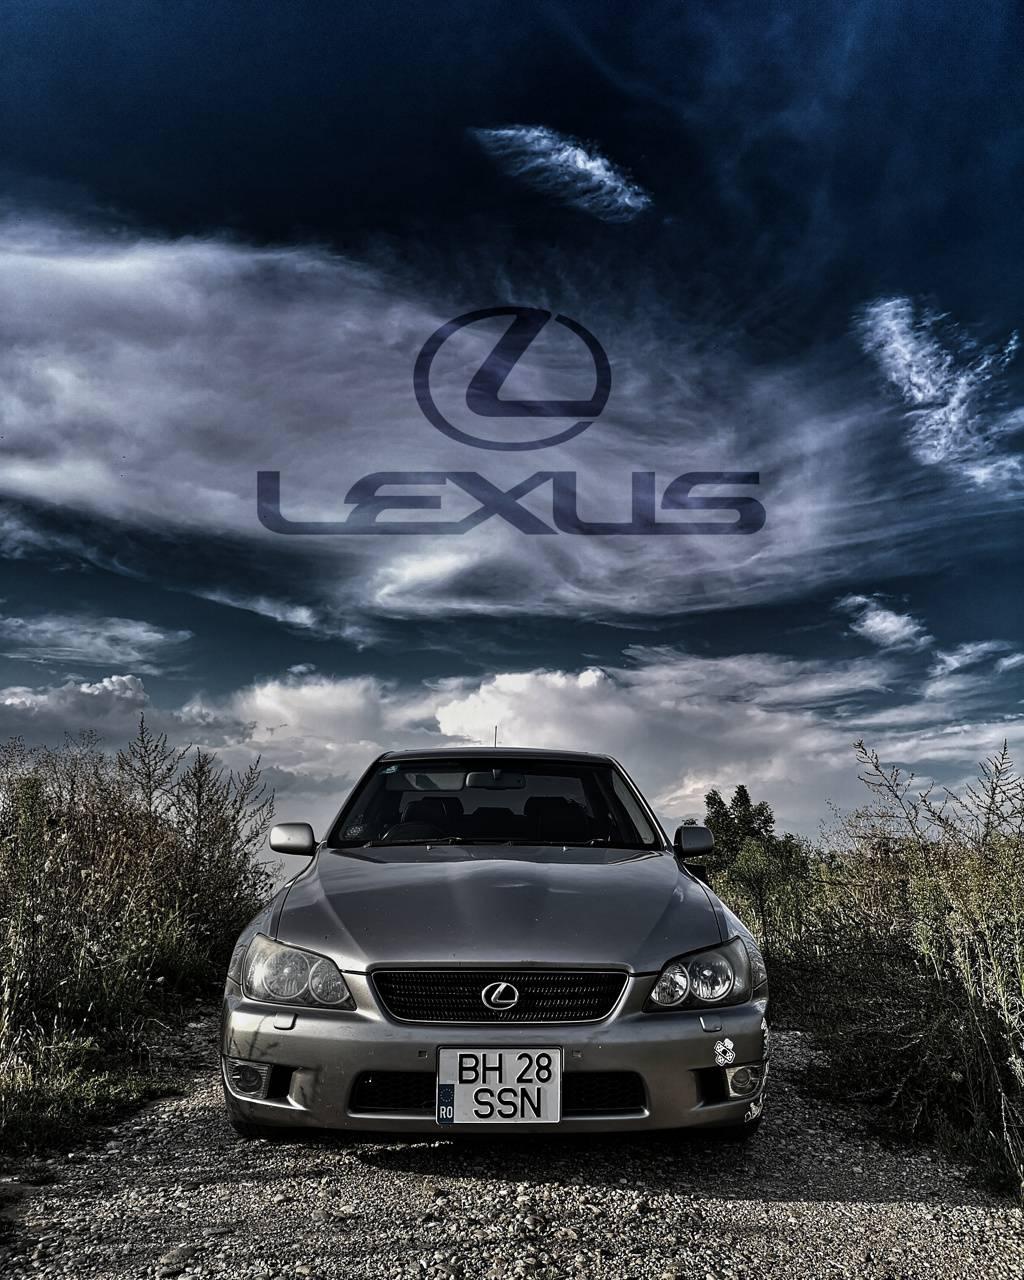 Lexus Logo Wallpaper By Serbanssn 35 Free On Zedge